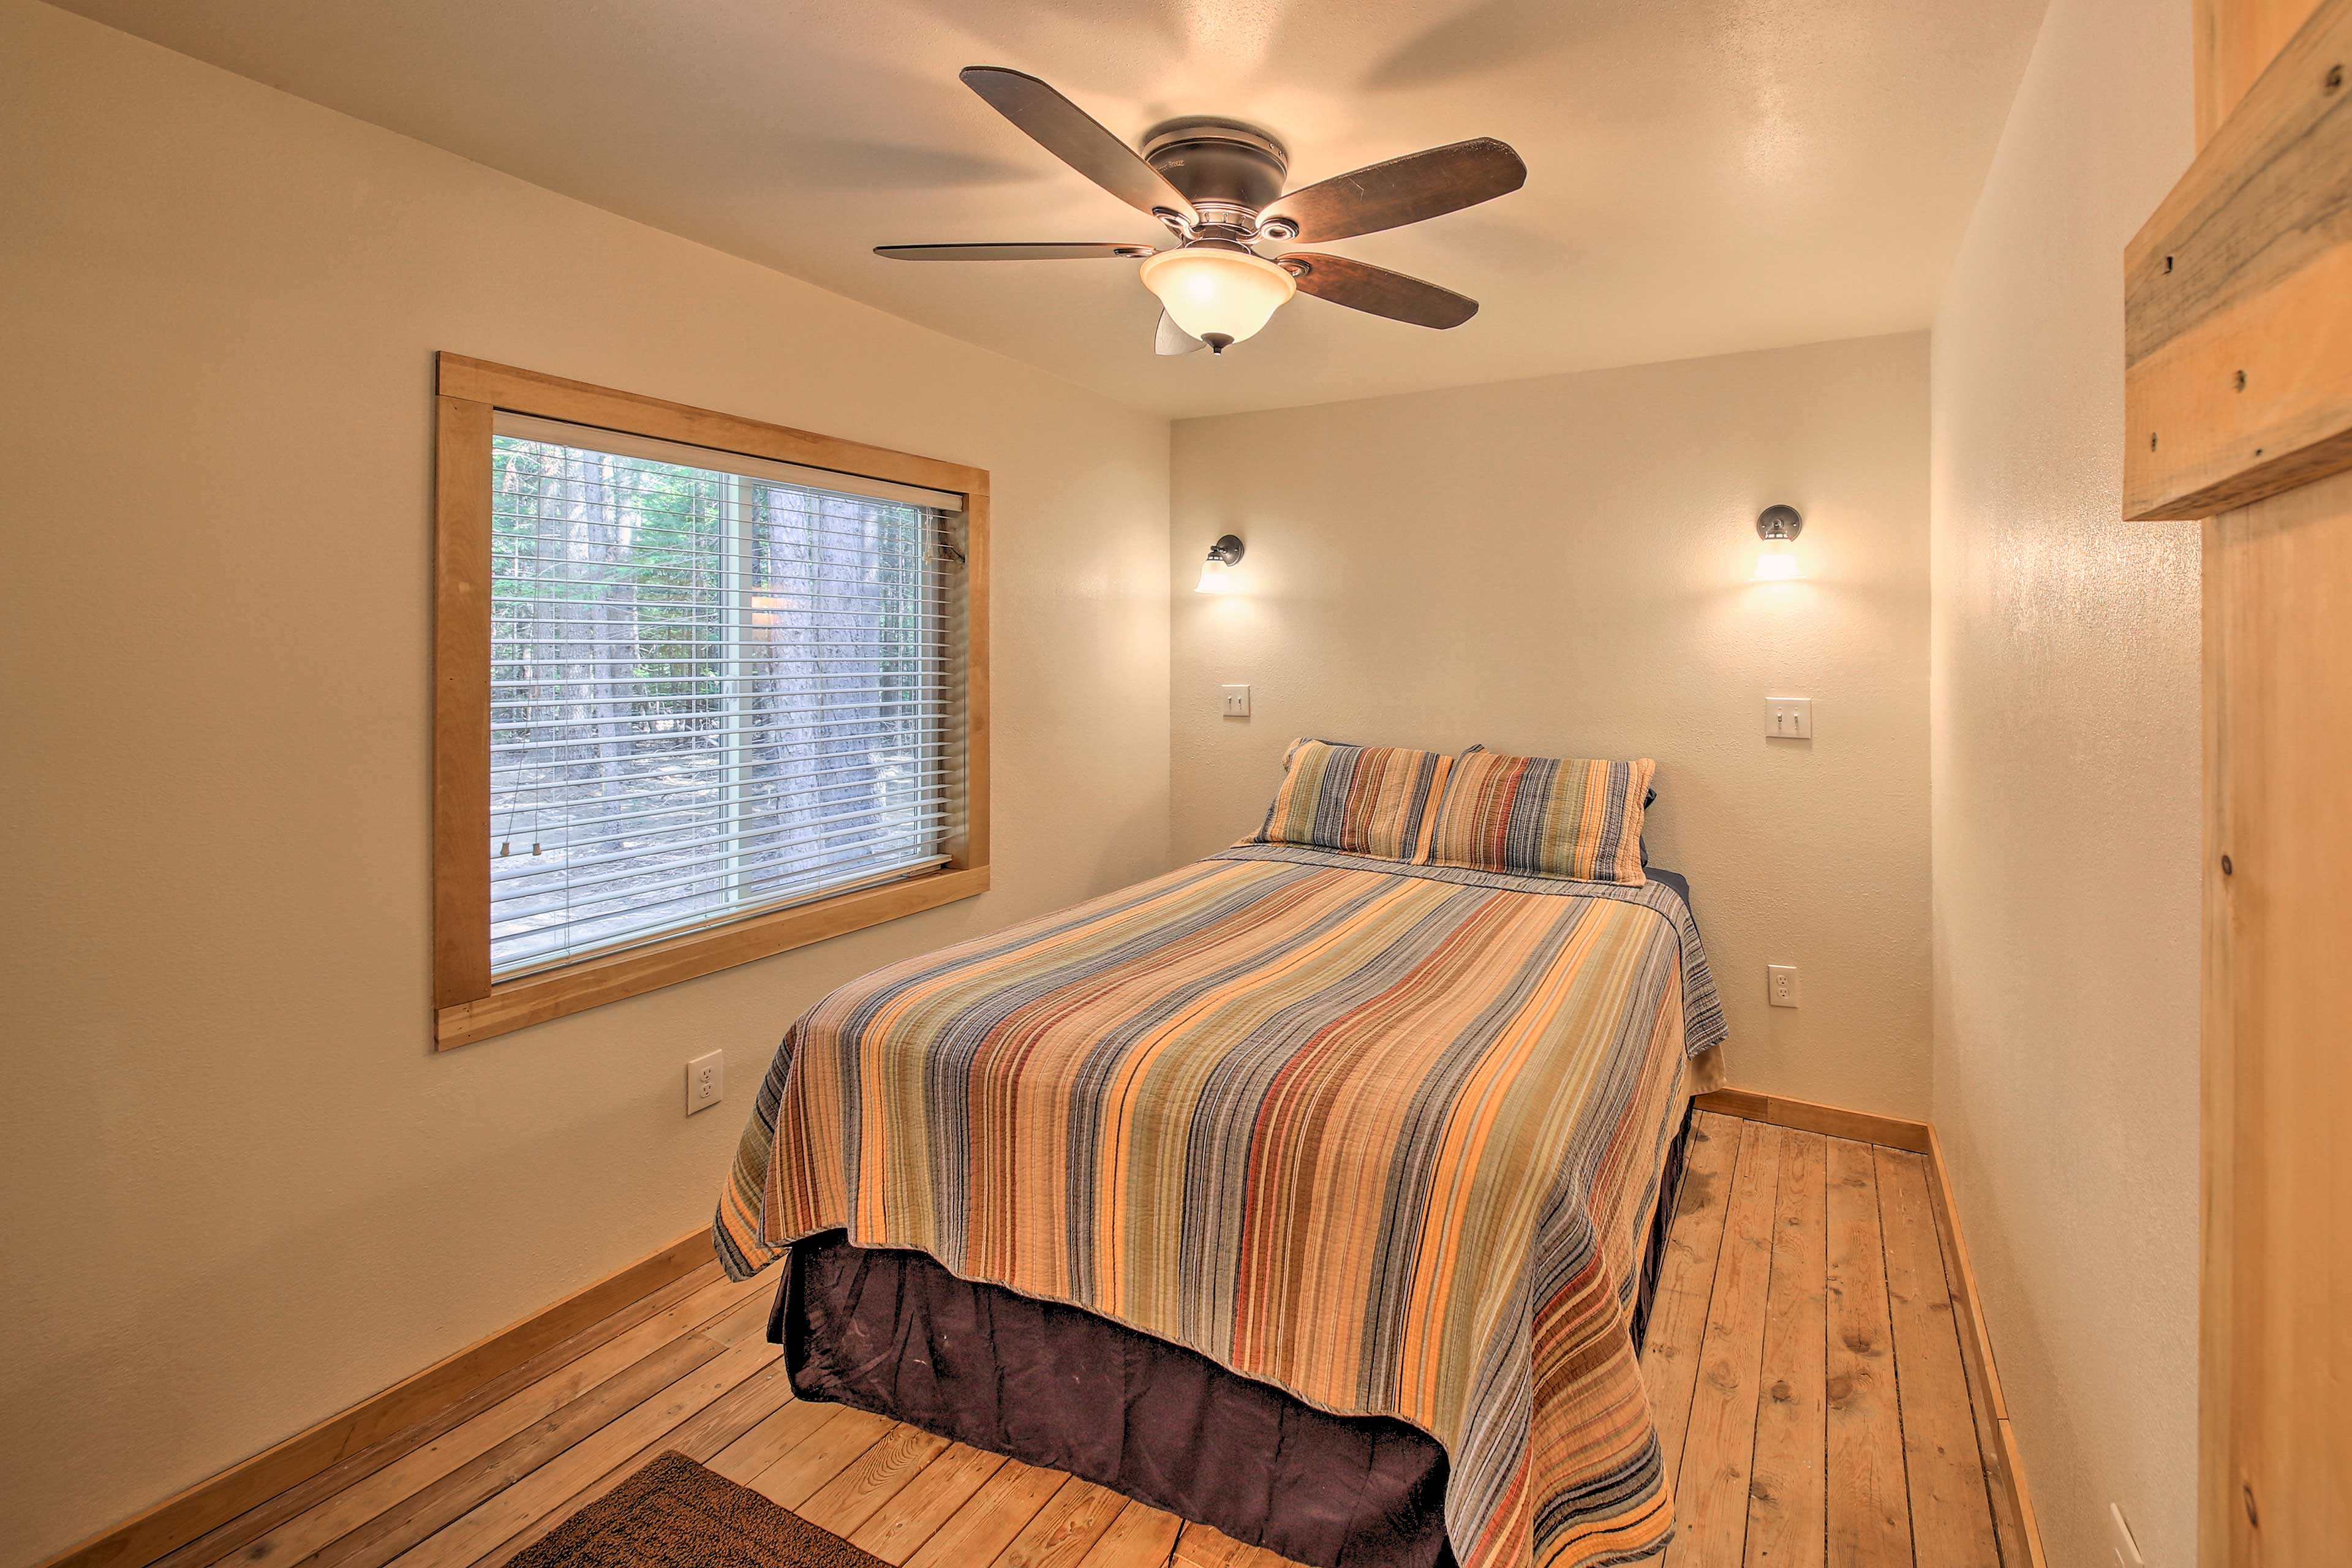 The bedroom features a cozy queen bed.